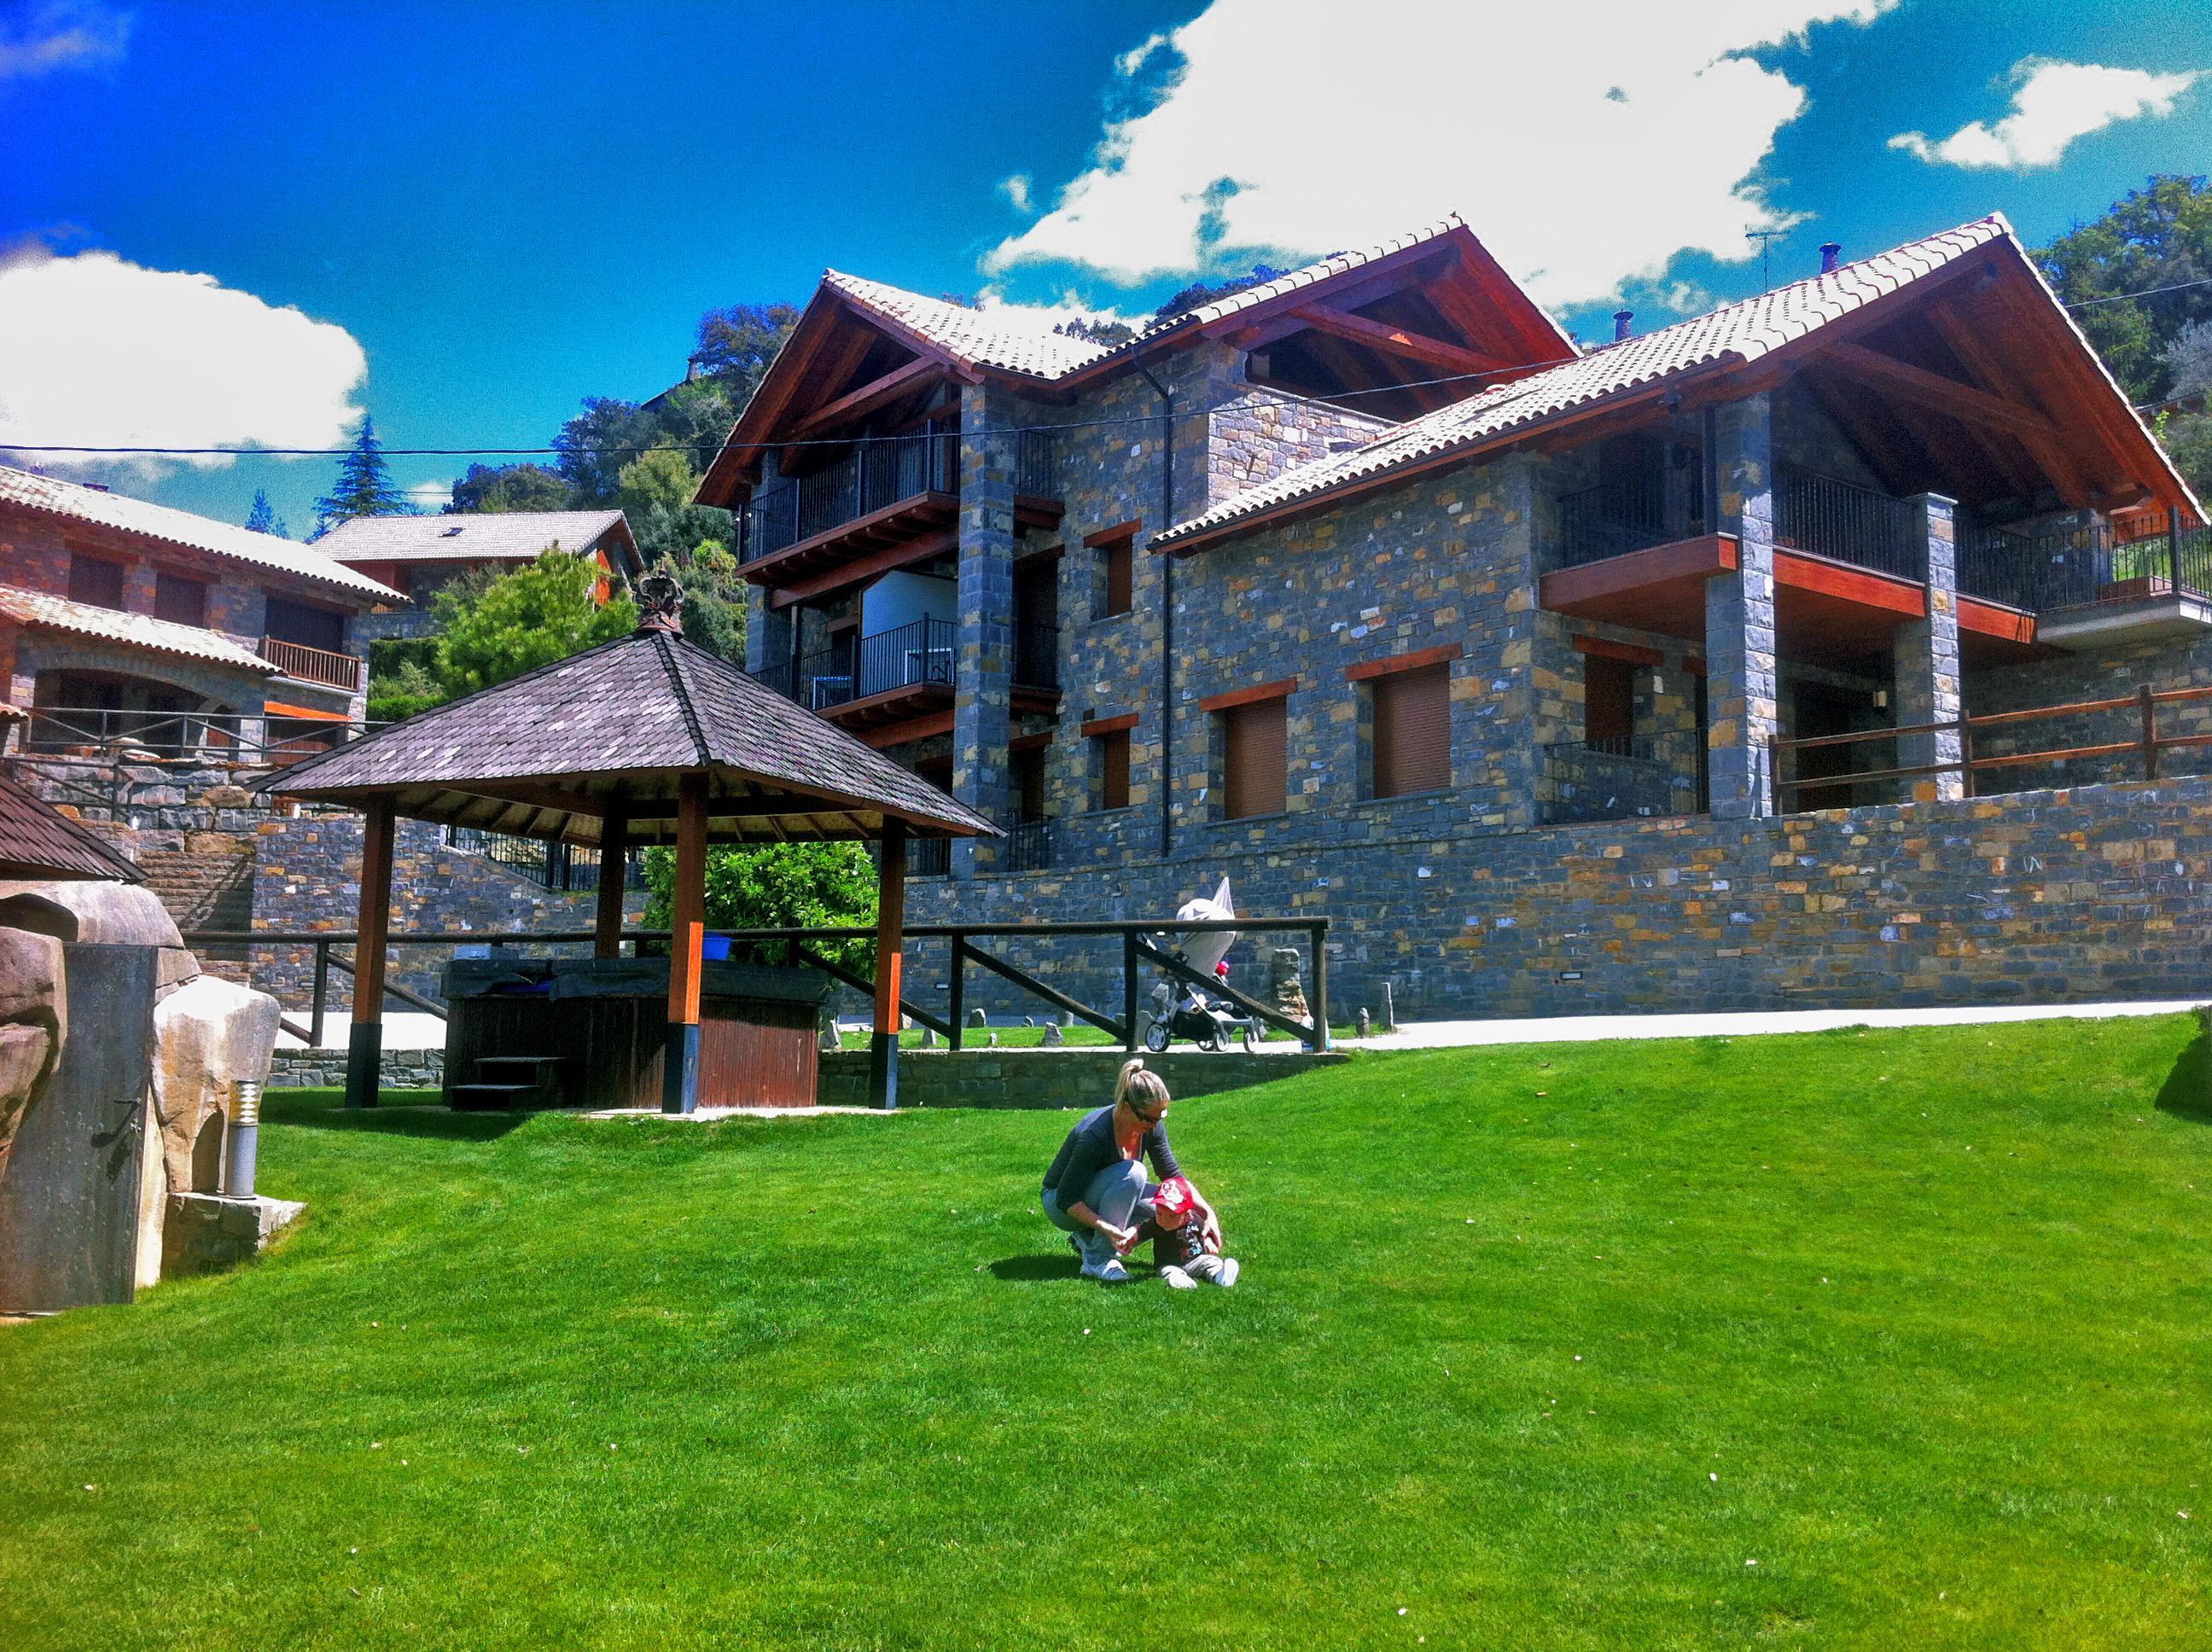 Fotos 10 casas rurales con piscina para ir con ni os for Casas rurales castellon con piscina